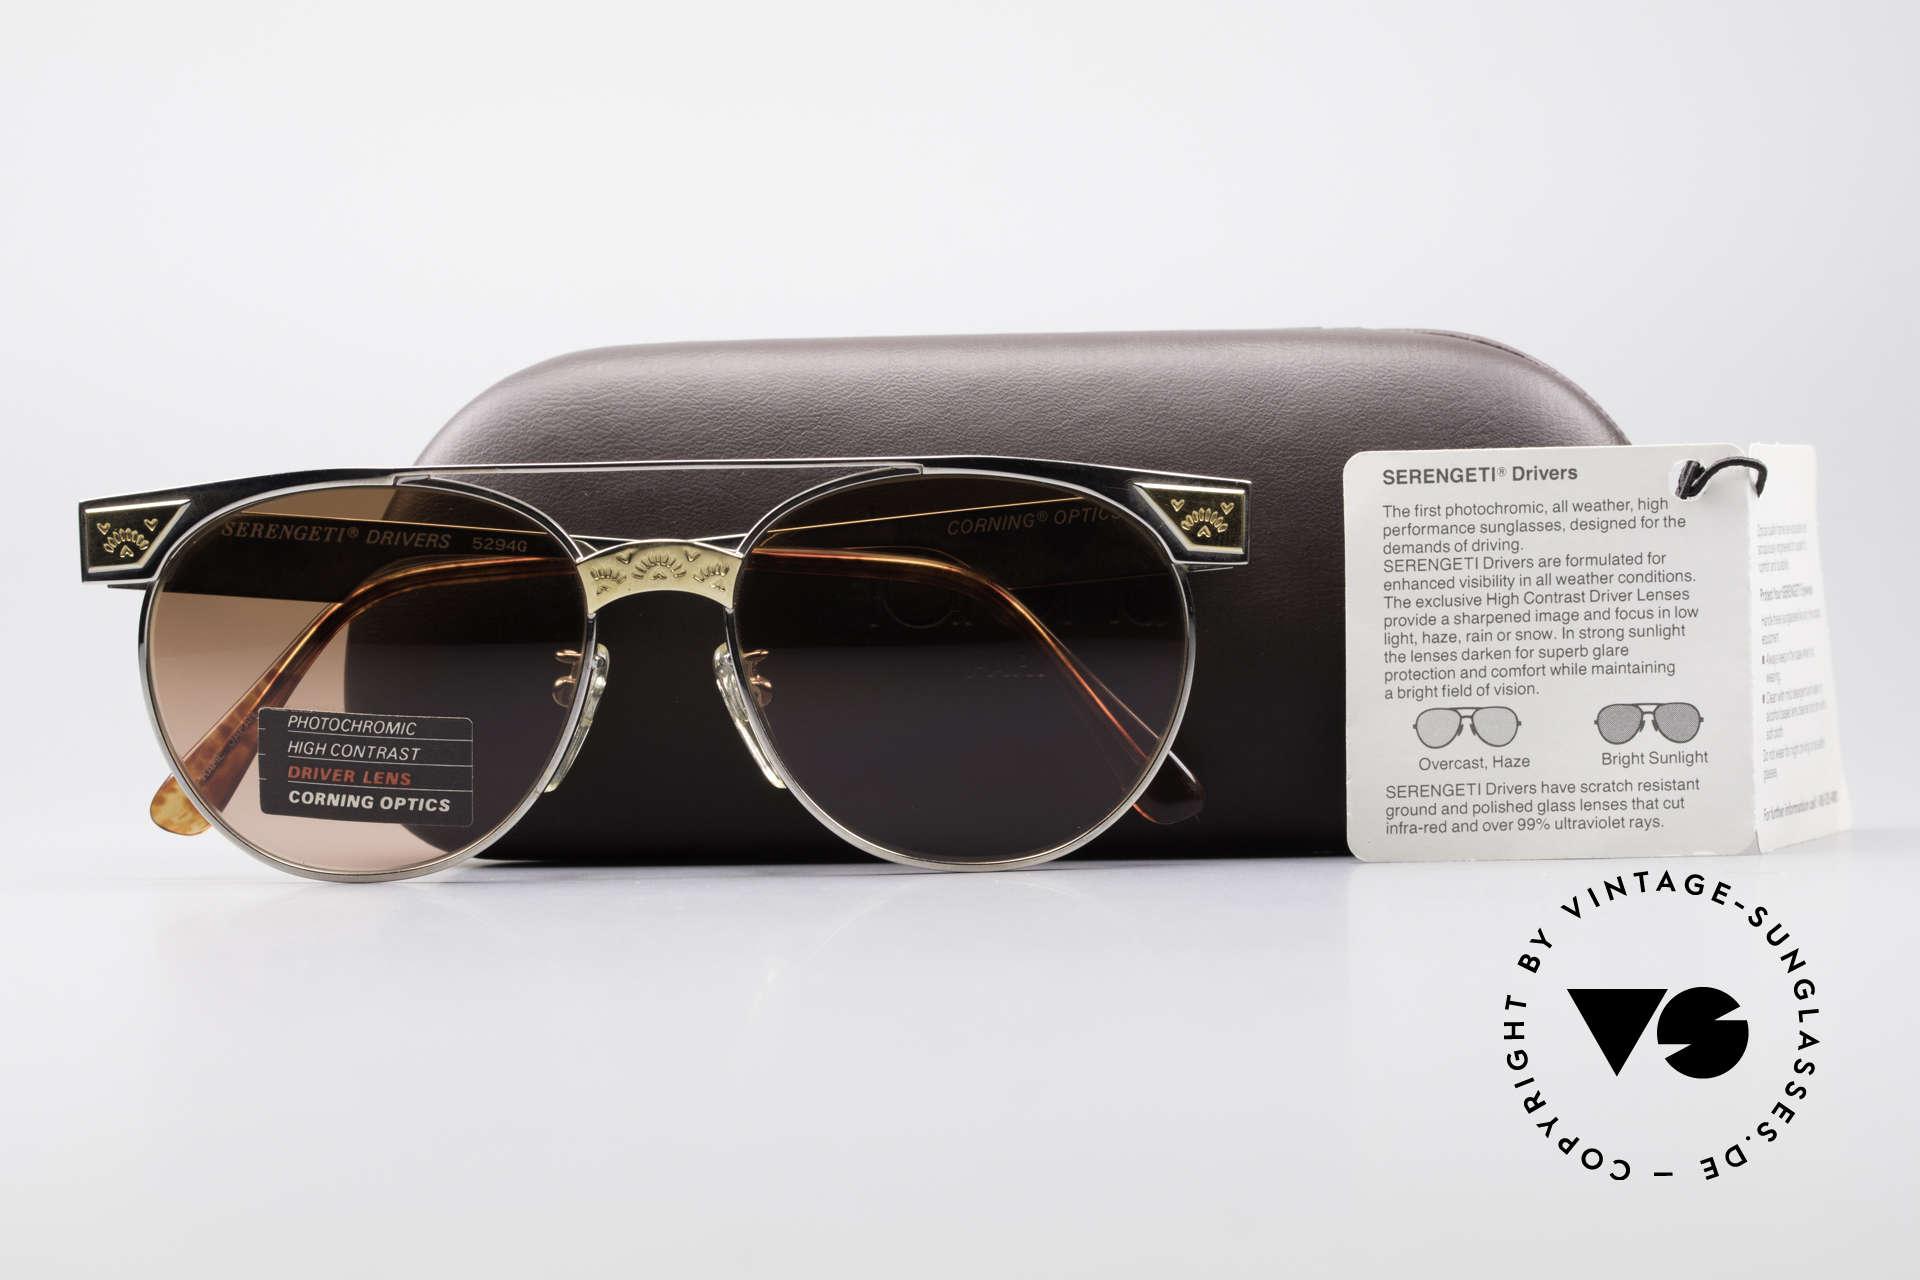 e9165949cf Sunglasses Serengeti Drivers 5294 High Contrast Driver Lens ...